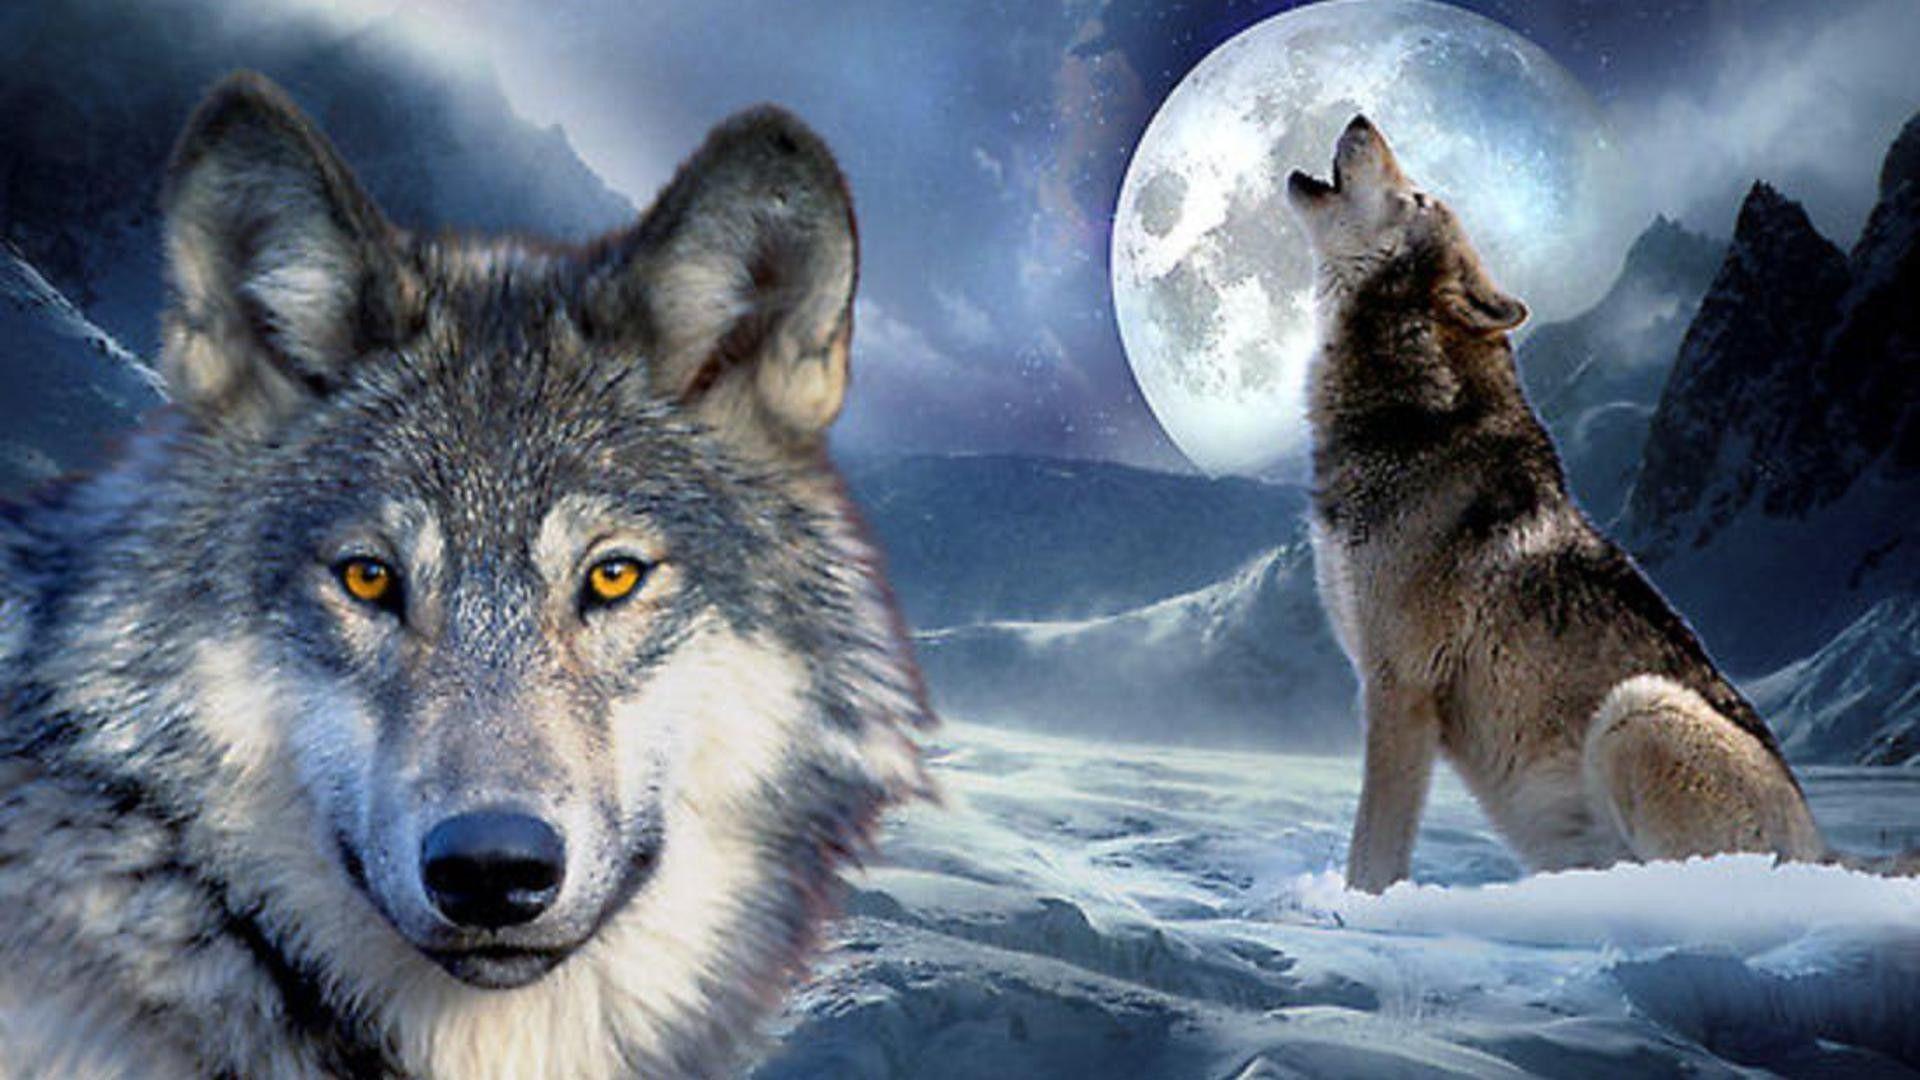 1920x1080 Wolves in Love hình nền